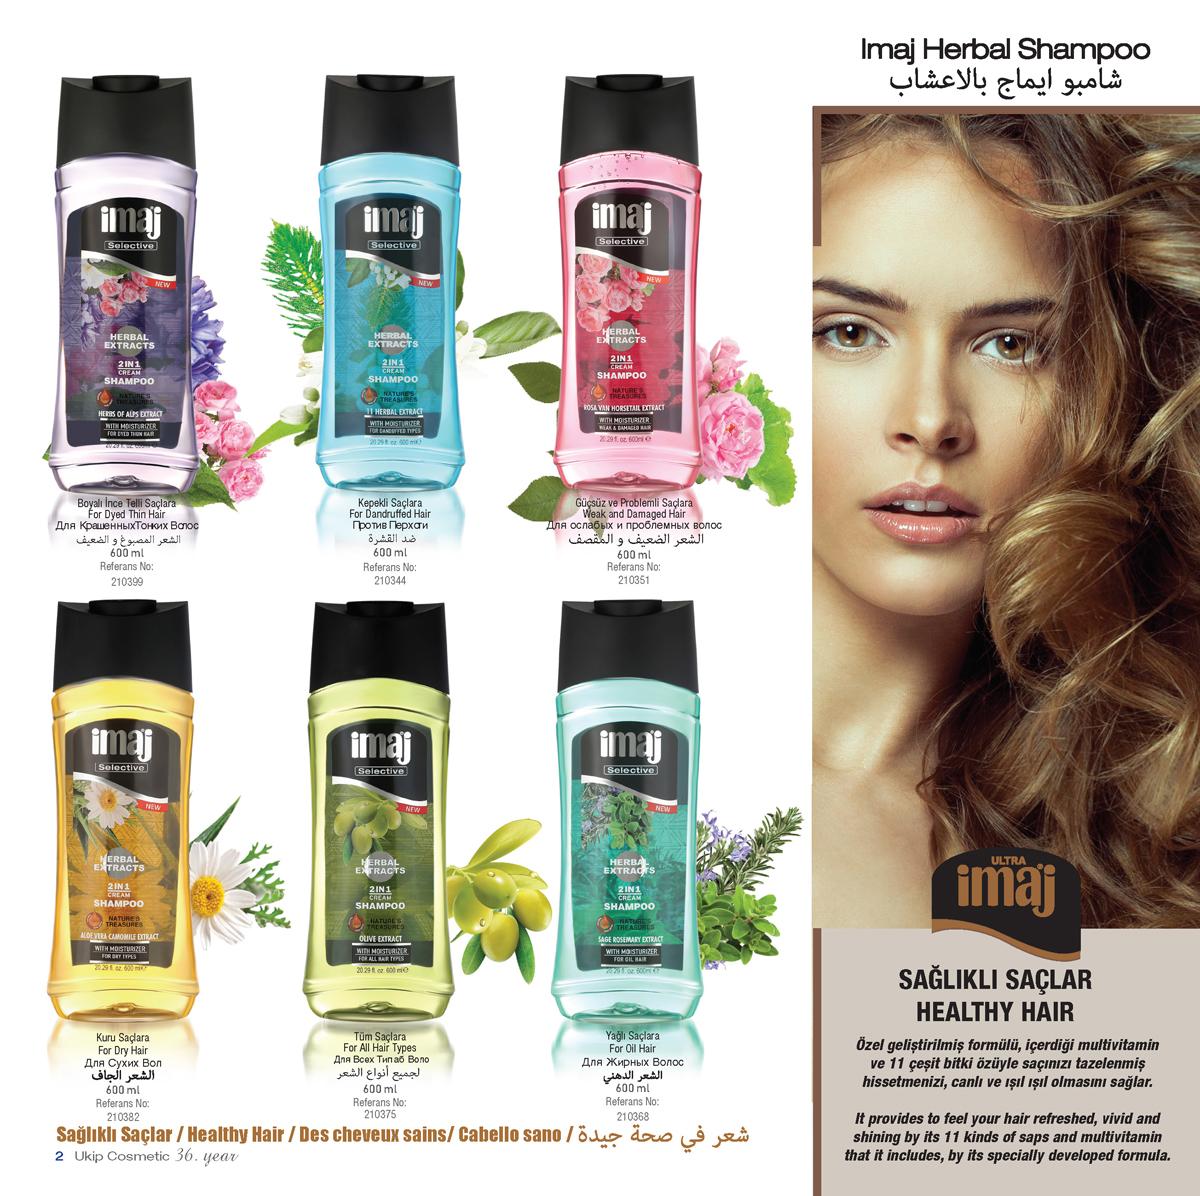 Imaj plant extract shampoo